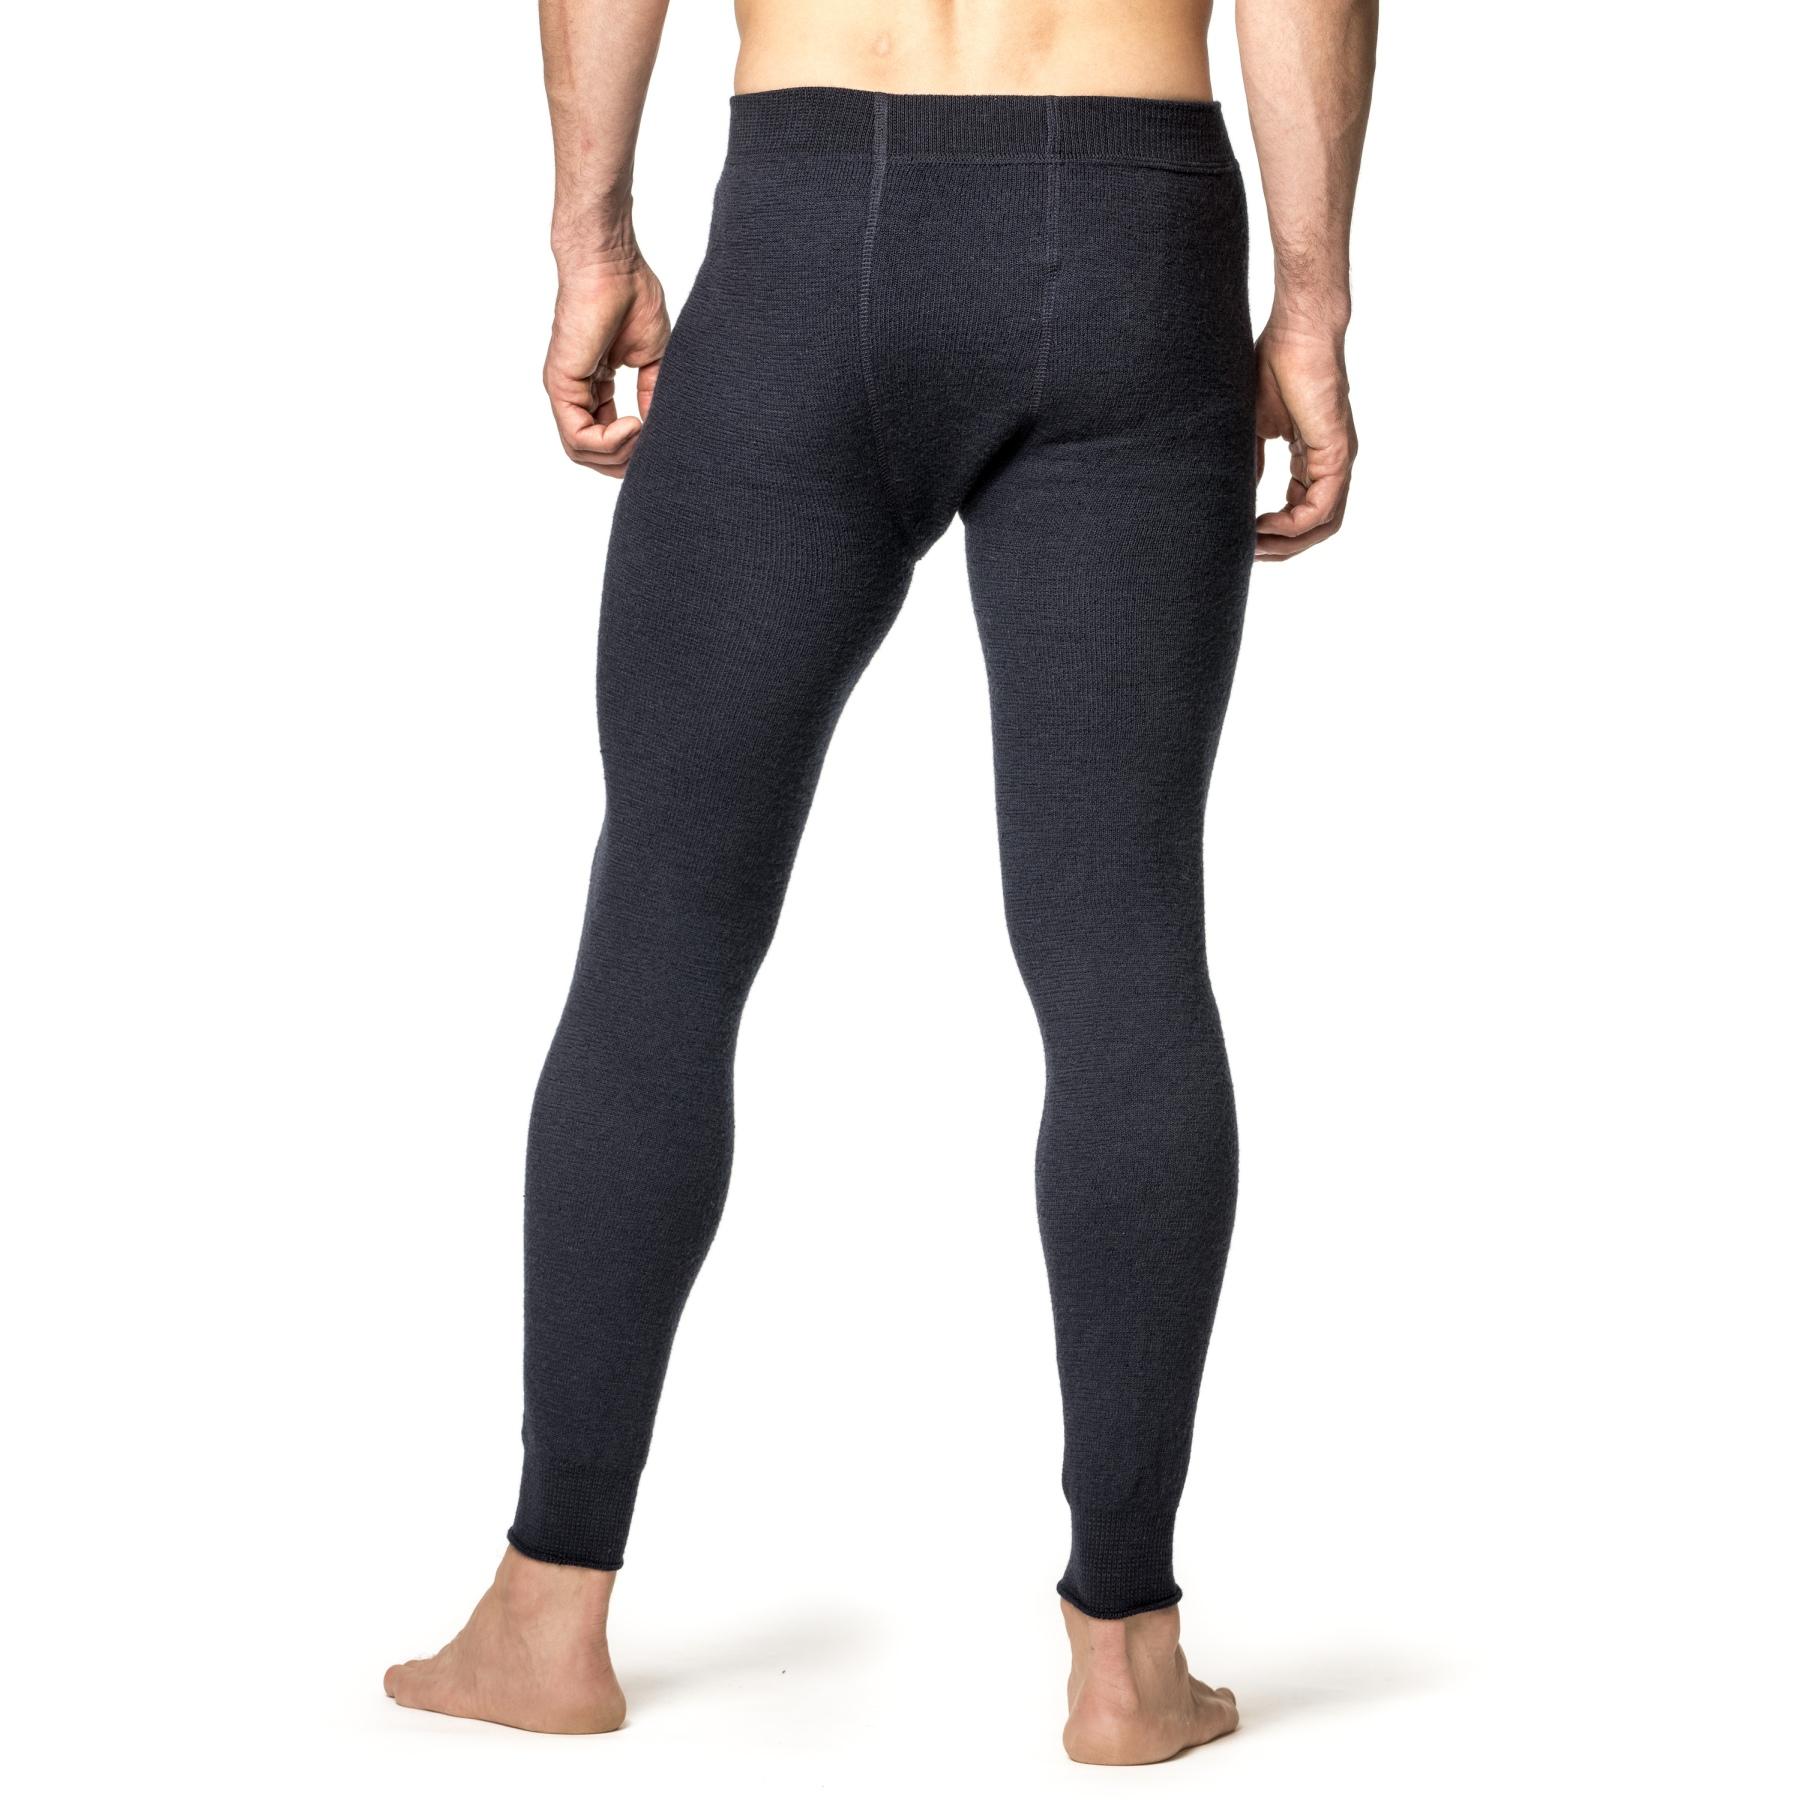 Image of Woolpower Long Johns 400 Underpants - dark navy